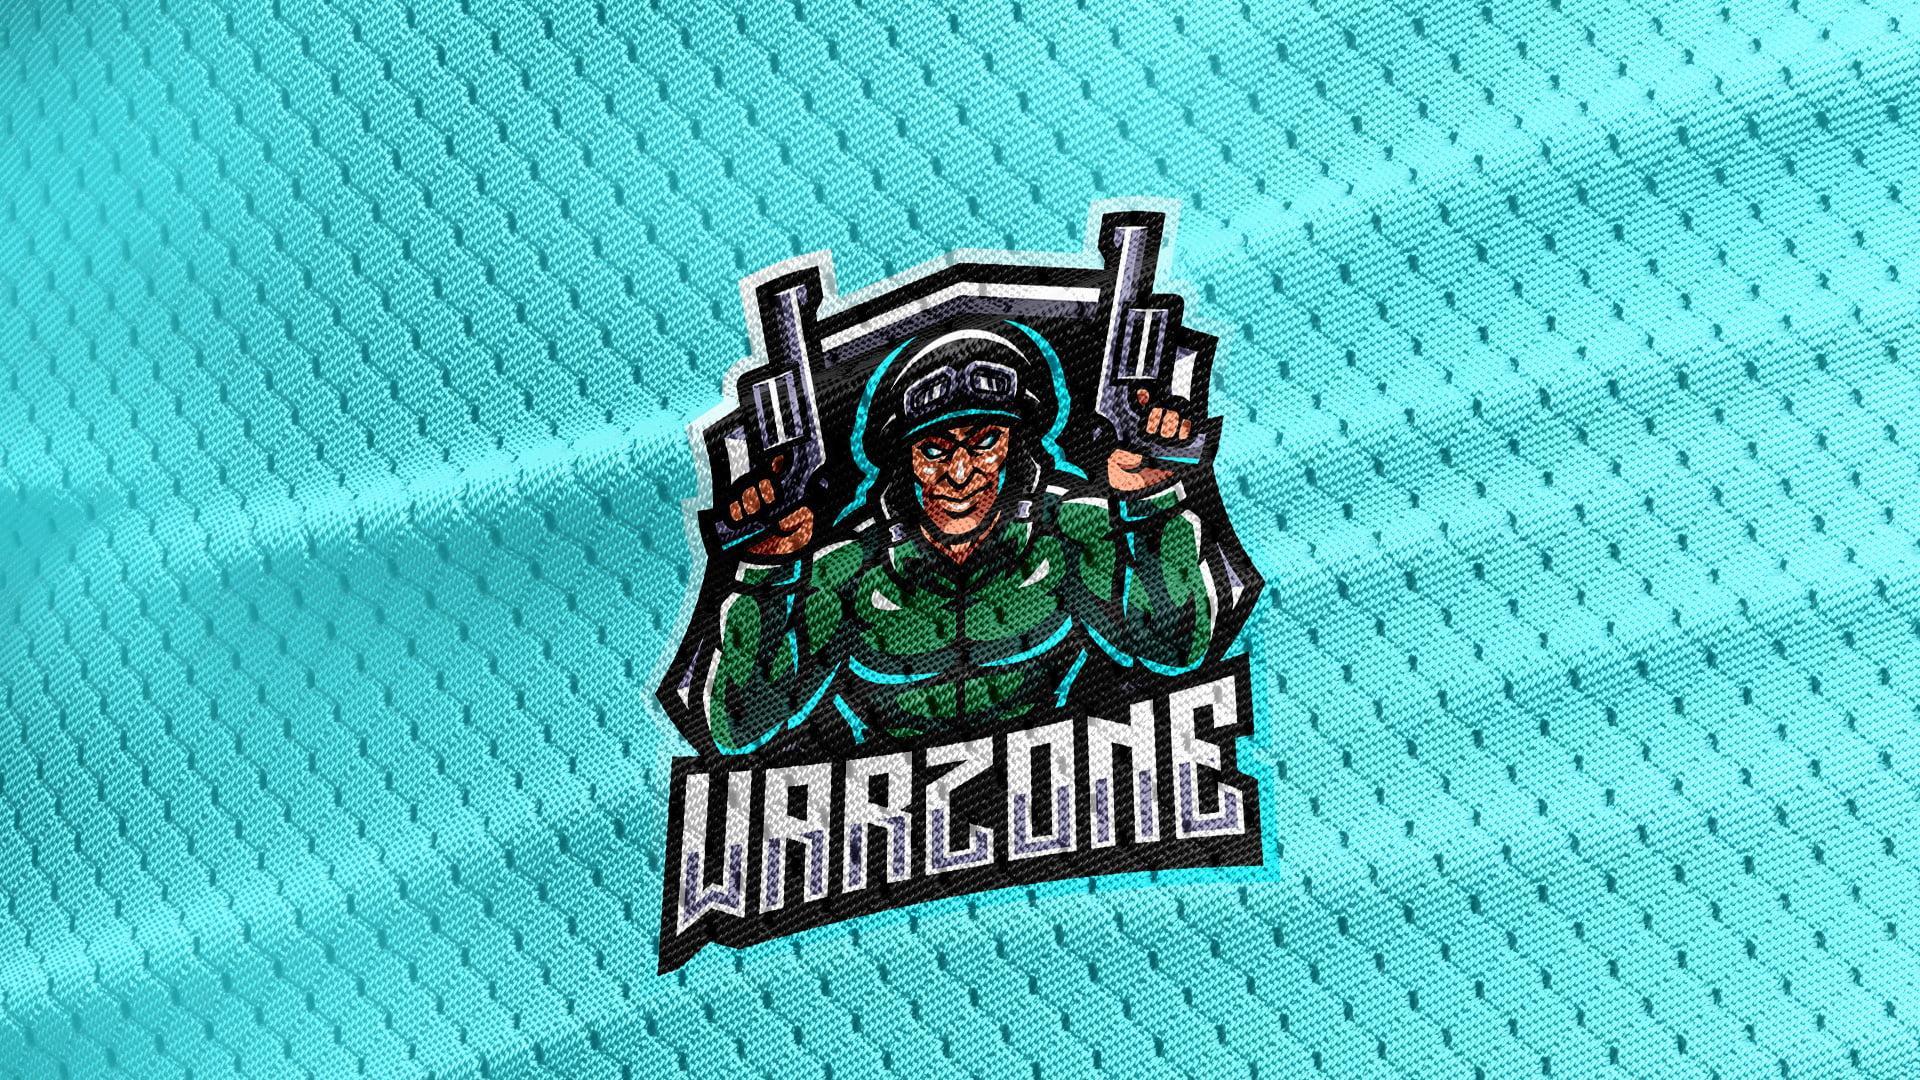 Cyan-Jersey-Texture-Free-Downloads-Warzone-Gaming-Mascot-Logo